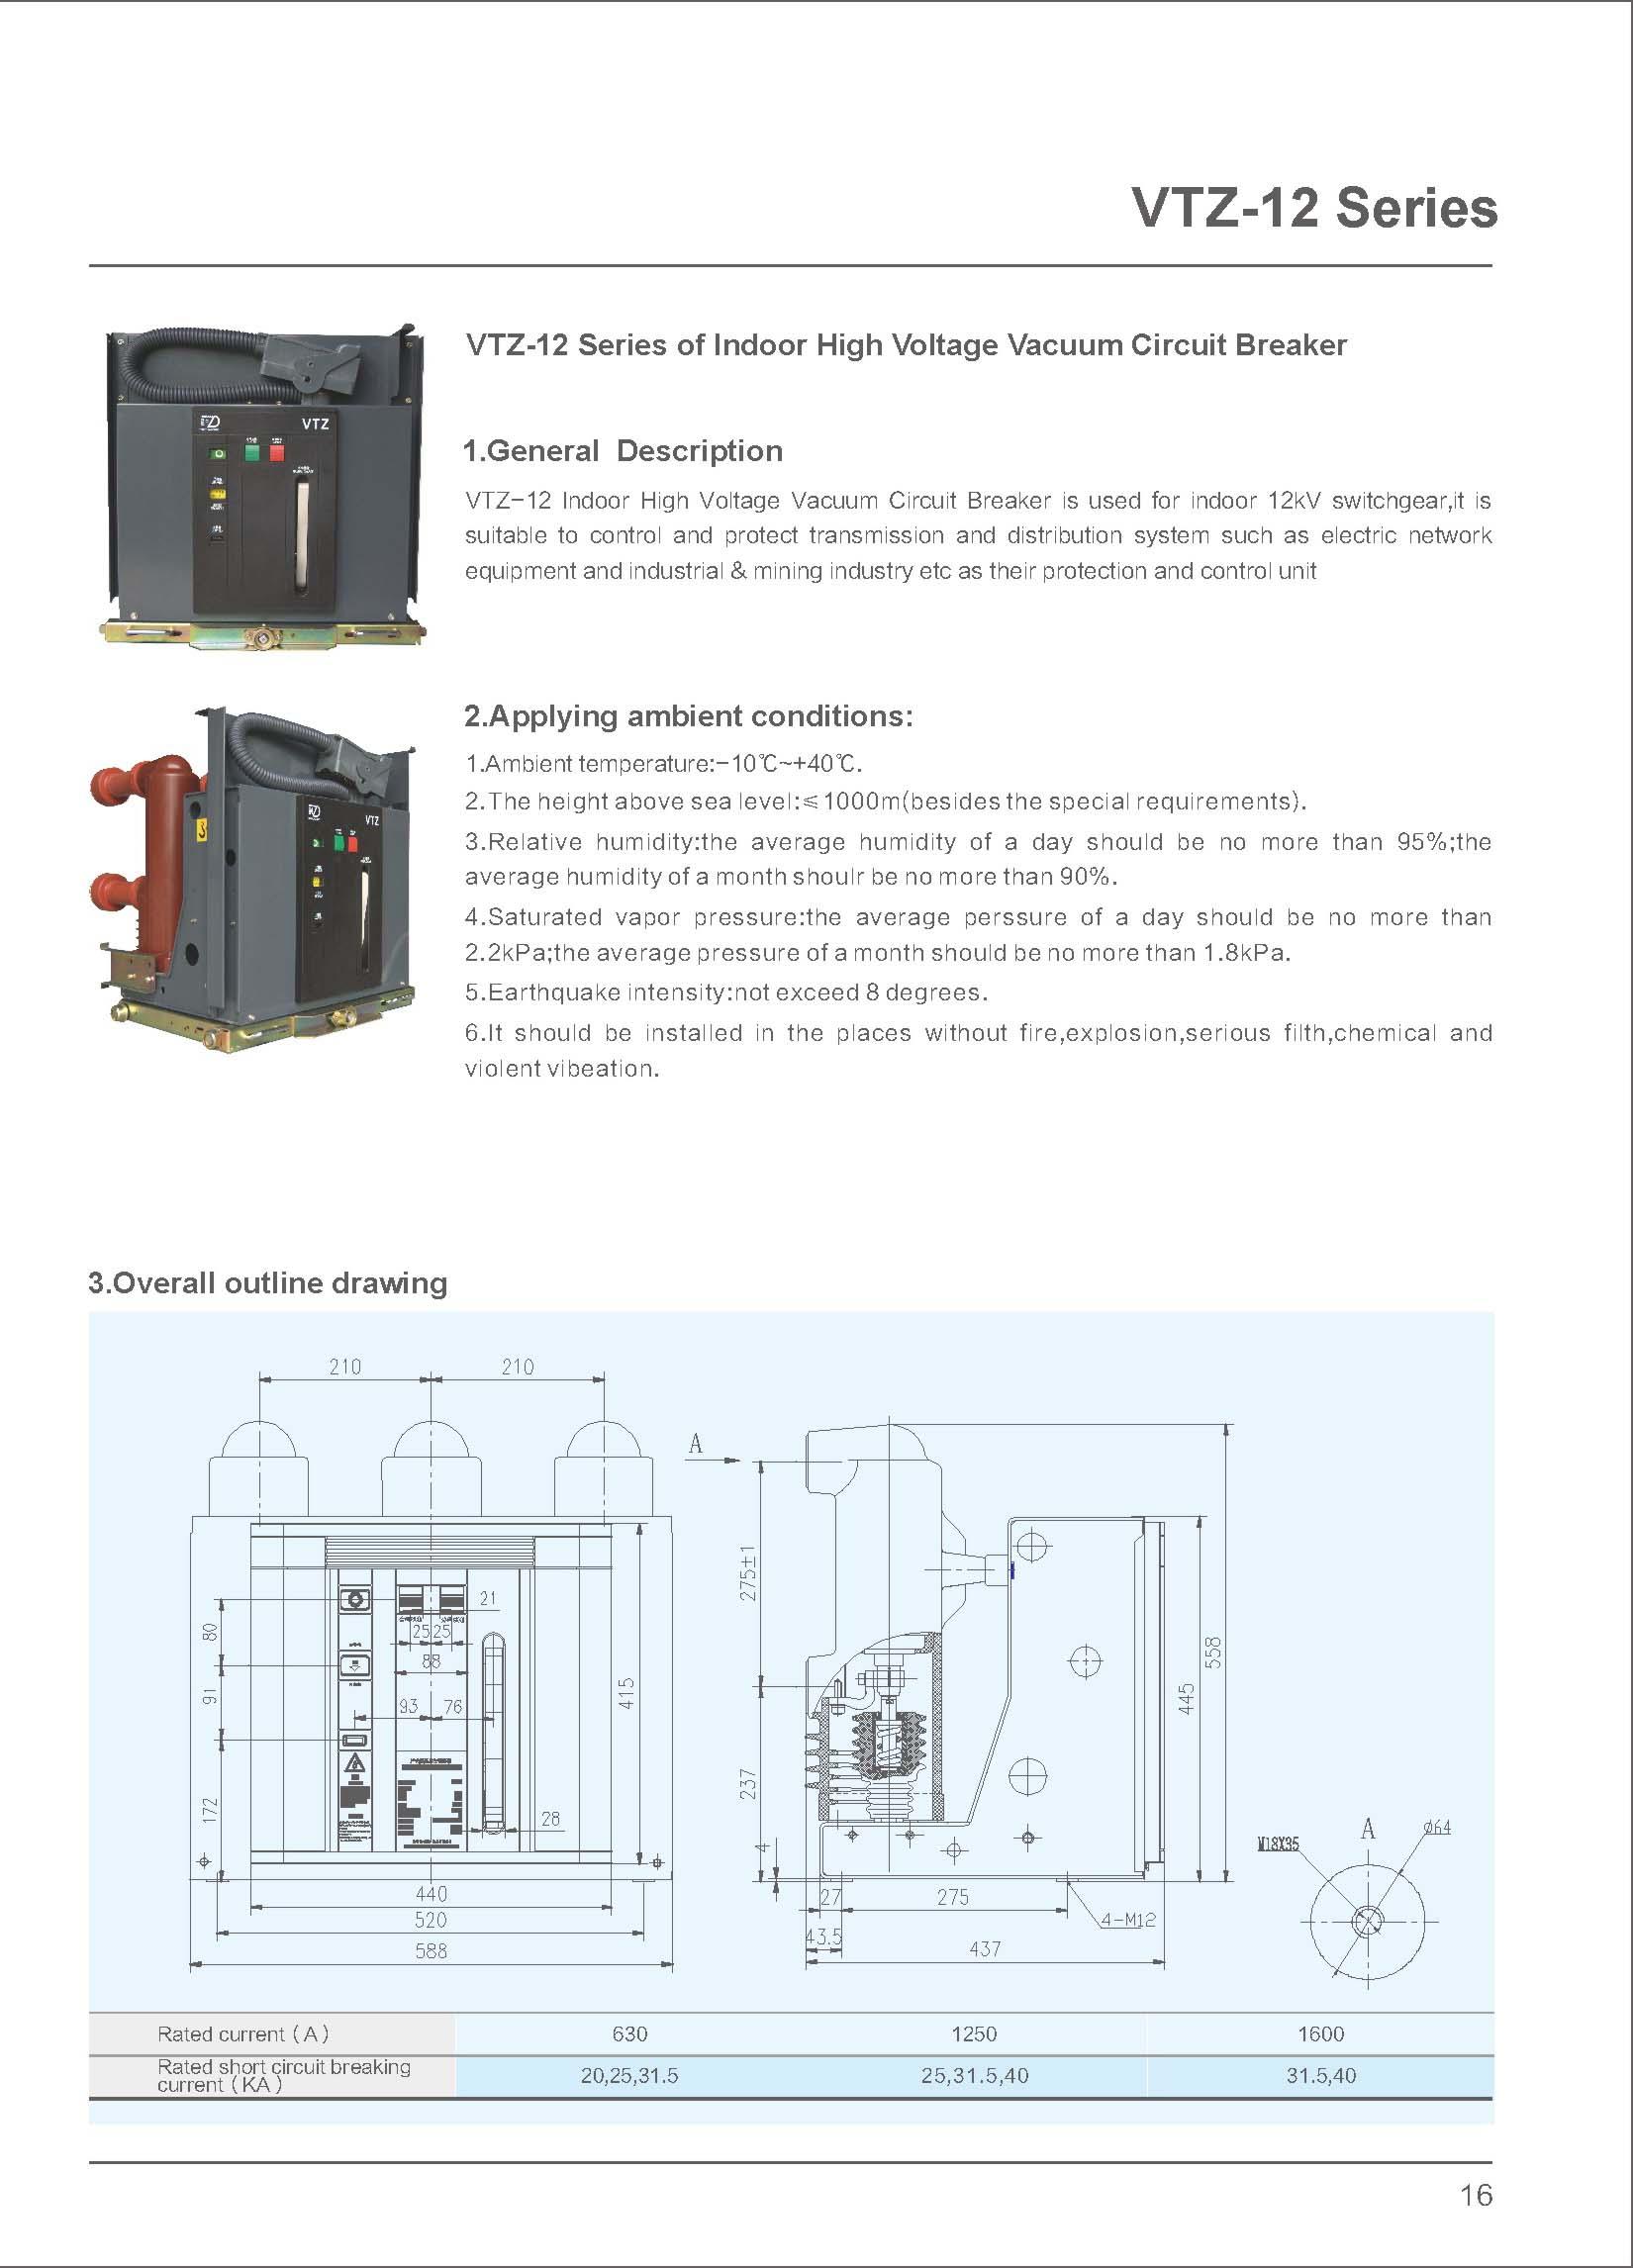 Embedded poles VCB Description